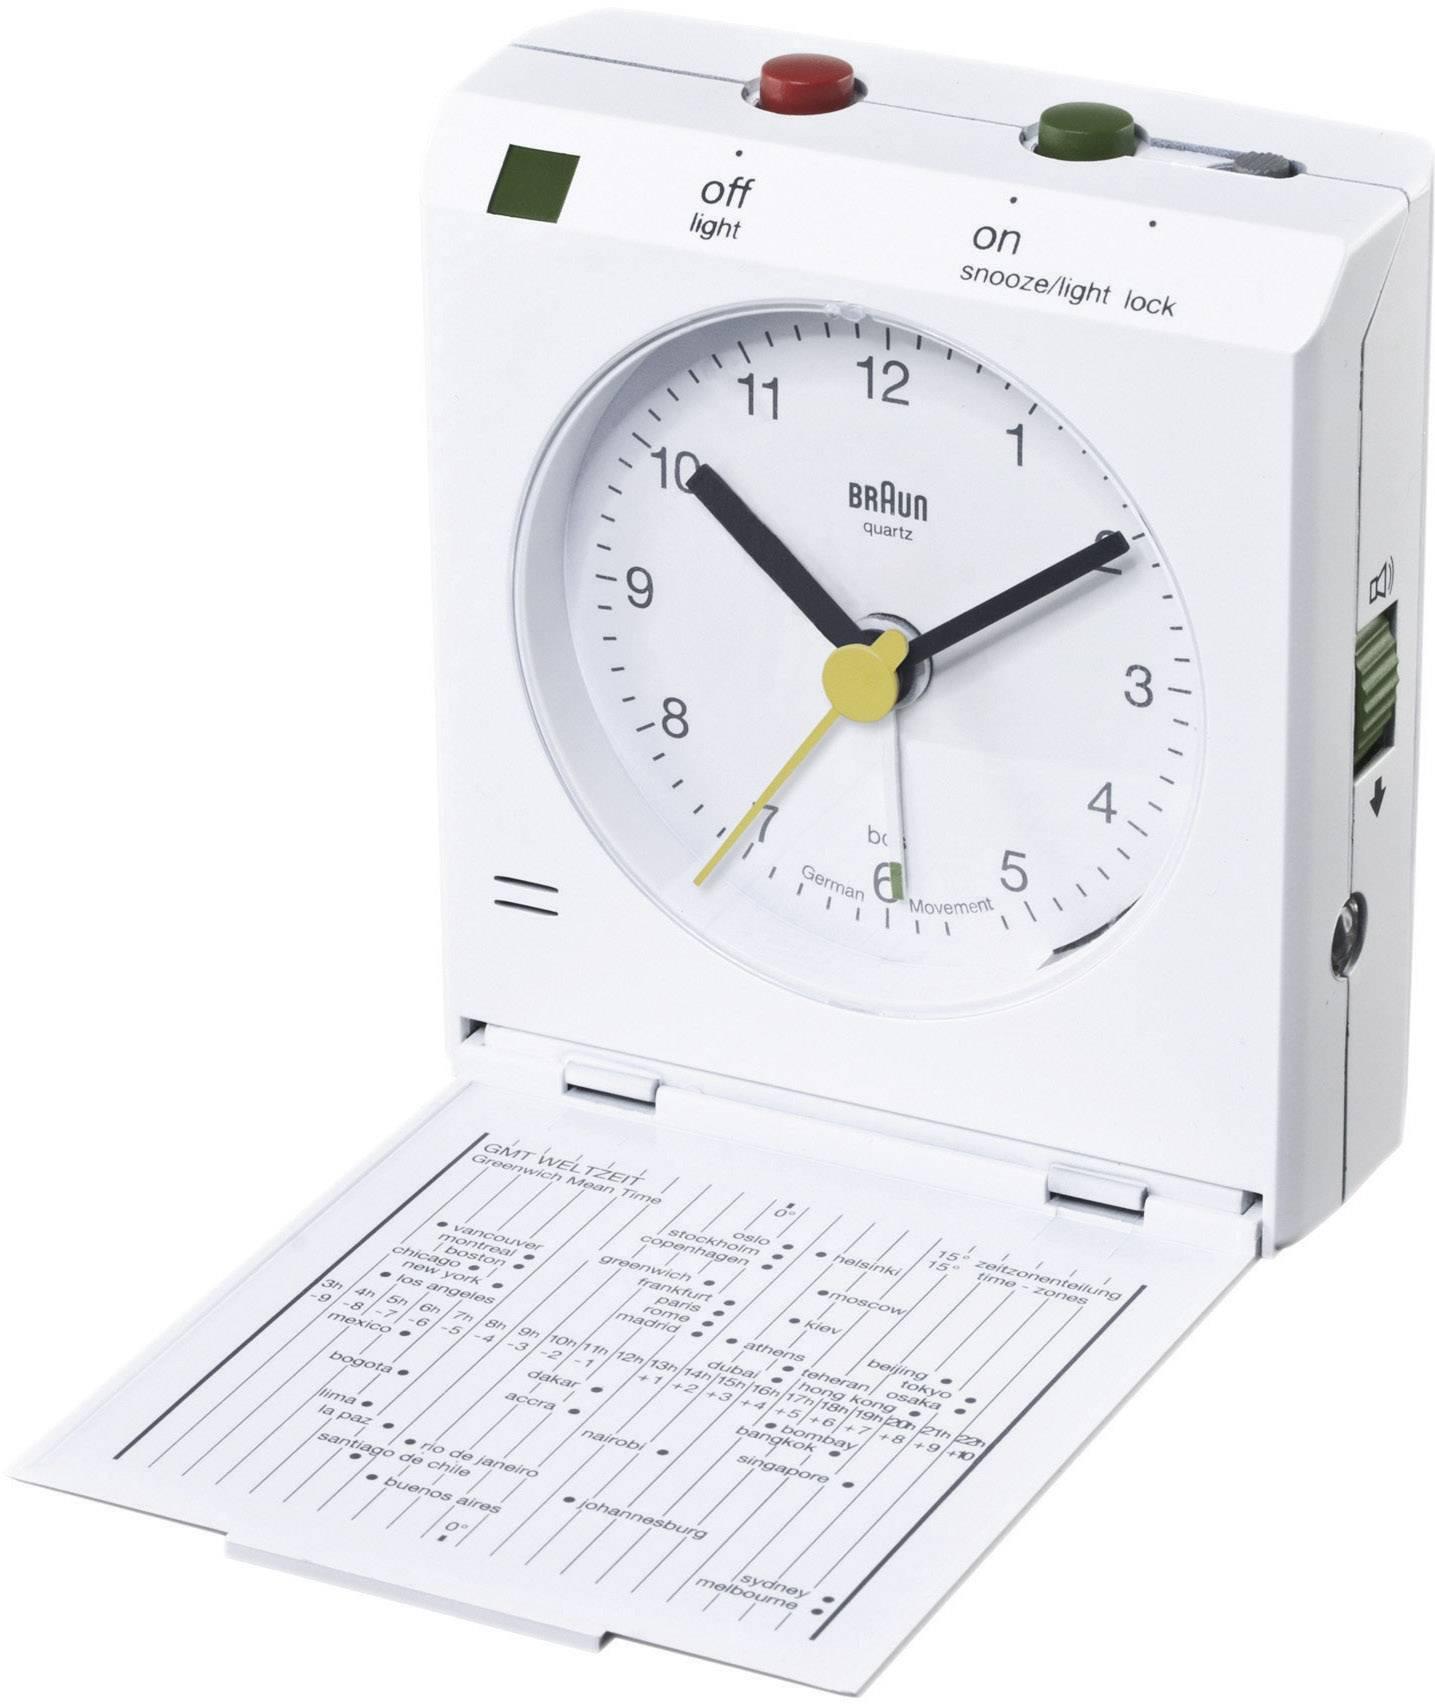 Analogový cestovní budík Braun Crescendo, 66024, 78 x 72 x 30 mm, bílá